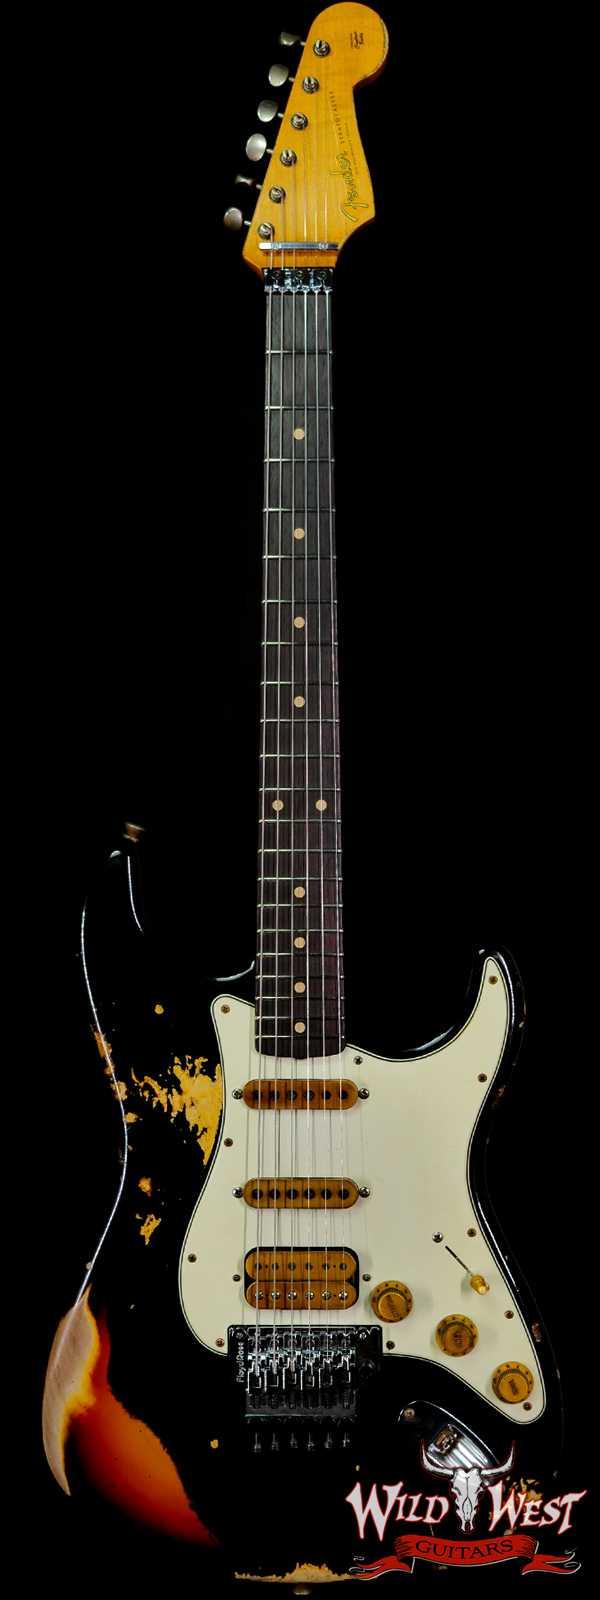 Fender Custom Shop Wild West Black Lightning Stratocaster Floyd Rose Heavy Relic Rosewood Board 3 Tone Sunburst